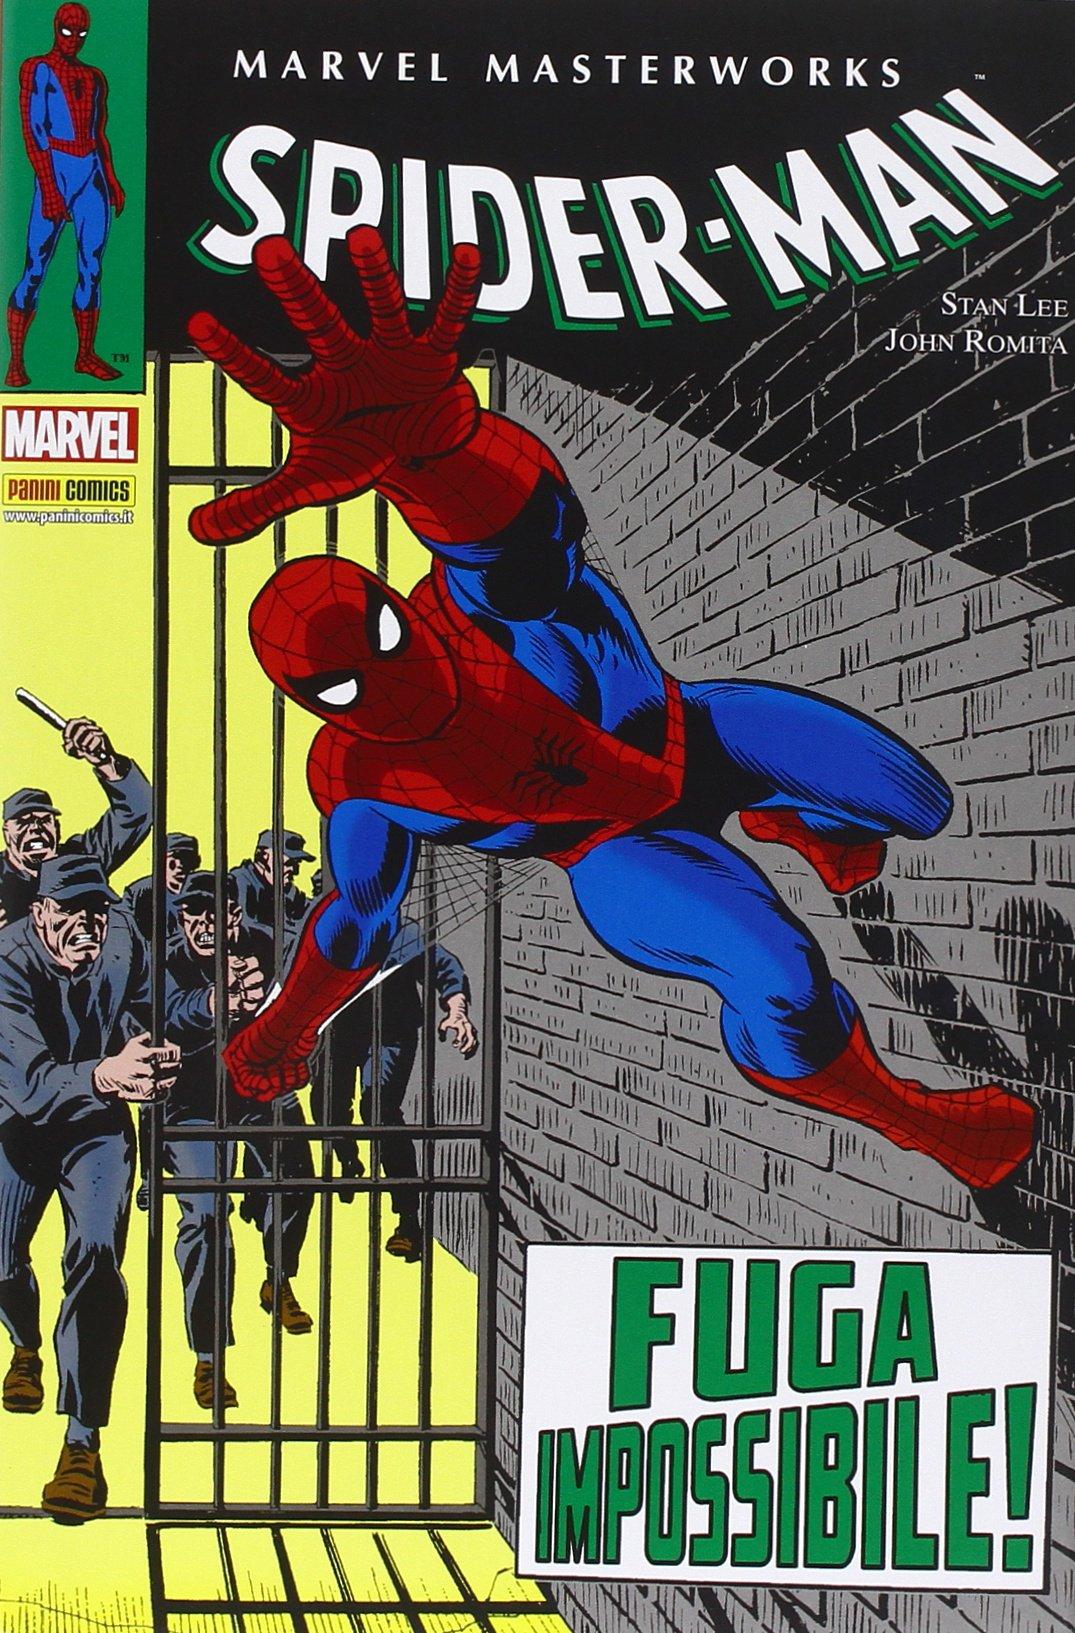 Marvel Masterworks: Spider-Man vol. 7